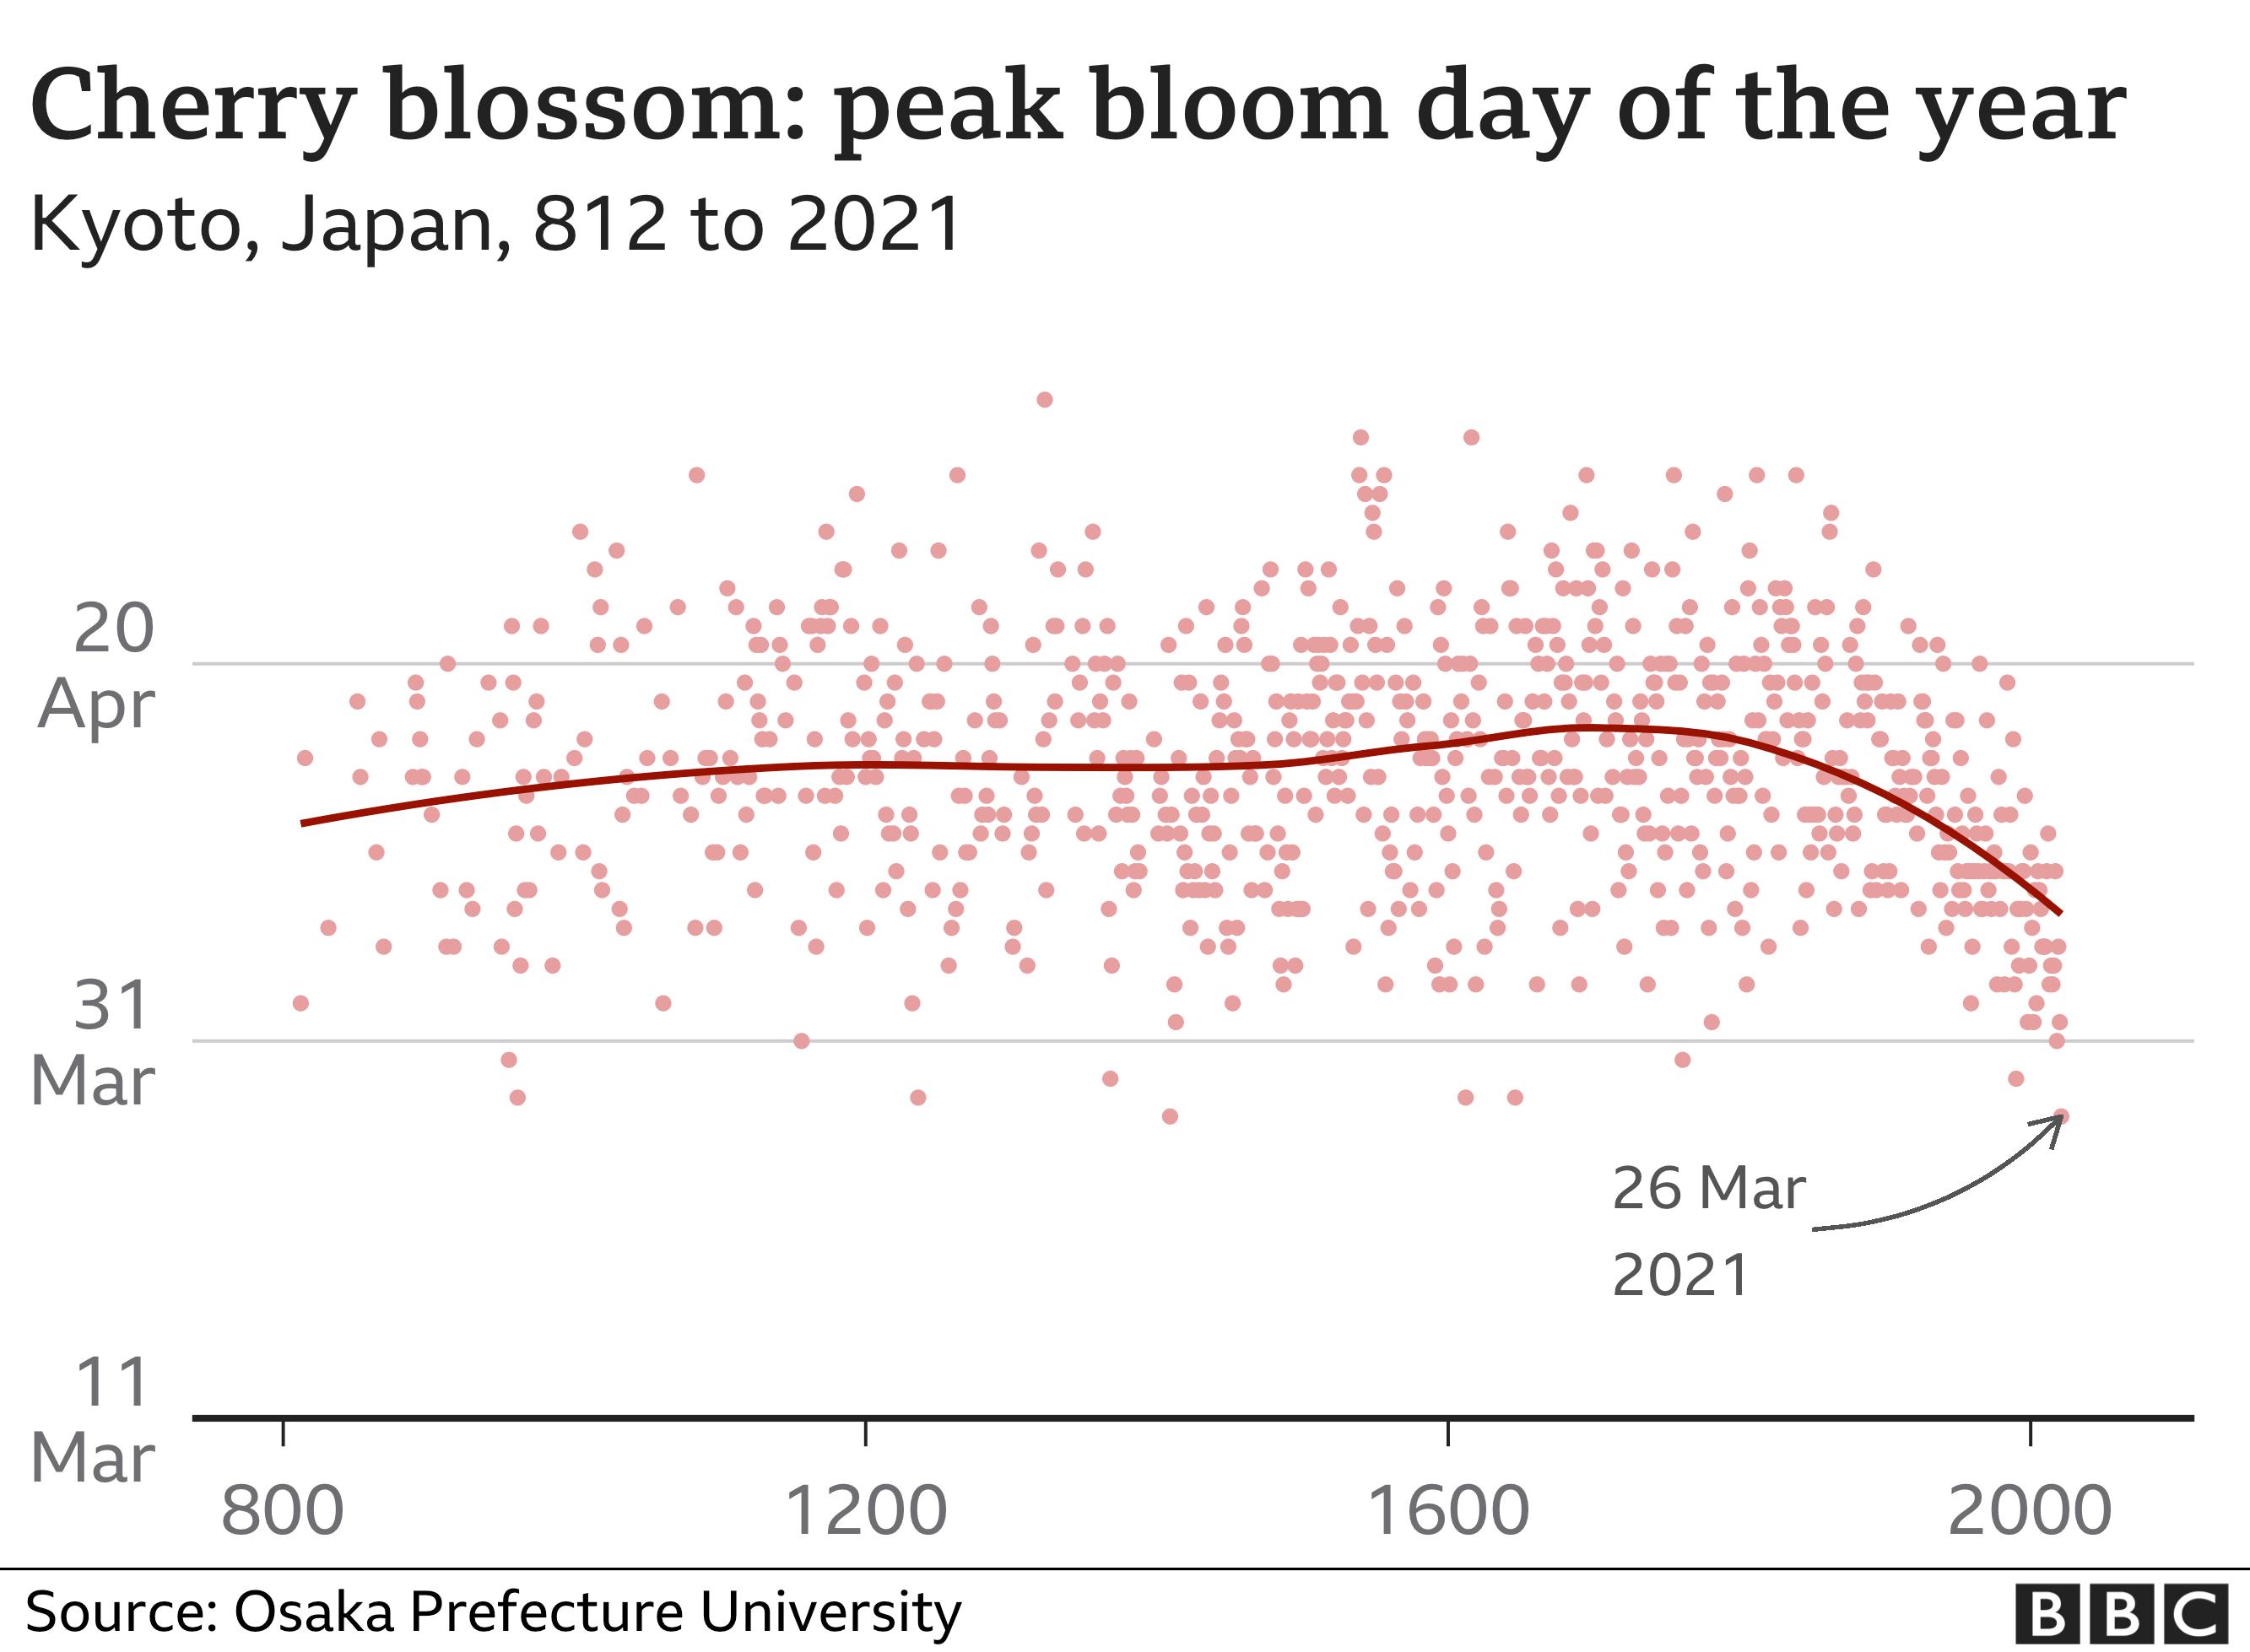 Japan's cherry blossom 'earliest peak since 812' thumbnail